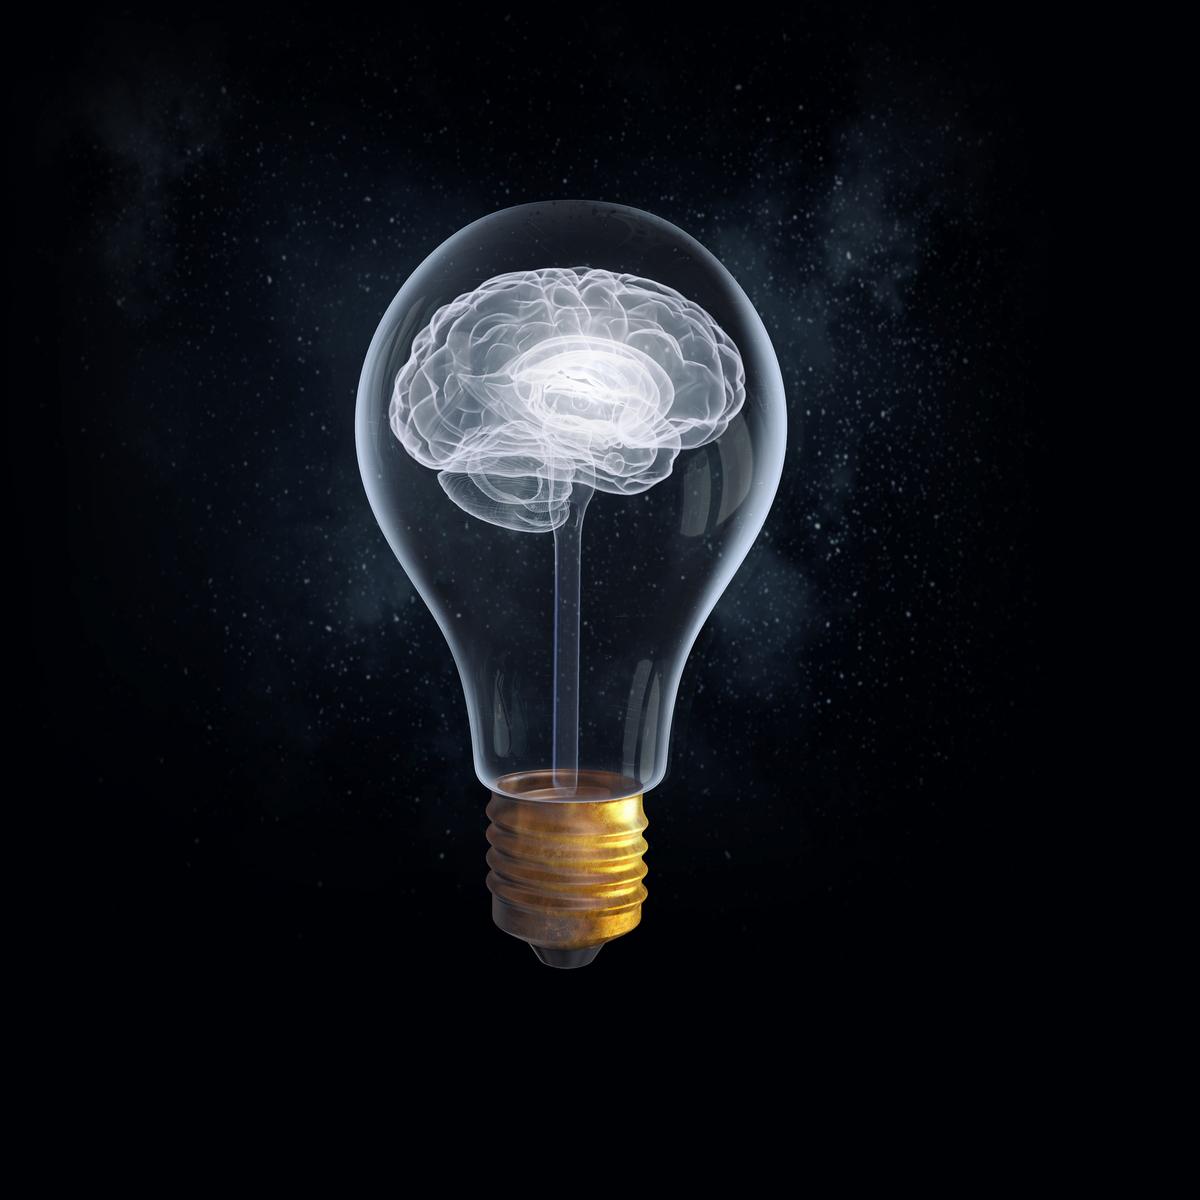 brain-inside-lamp